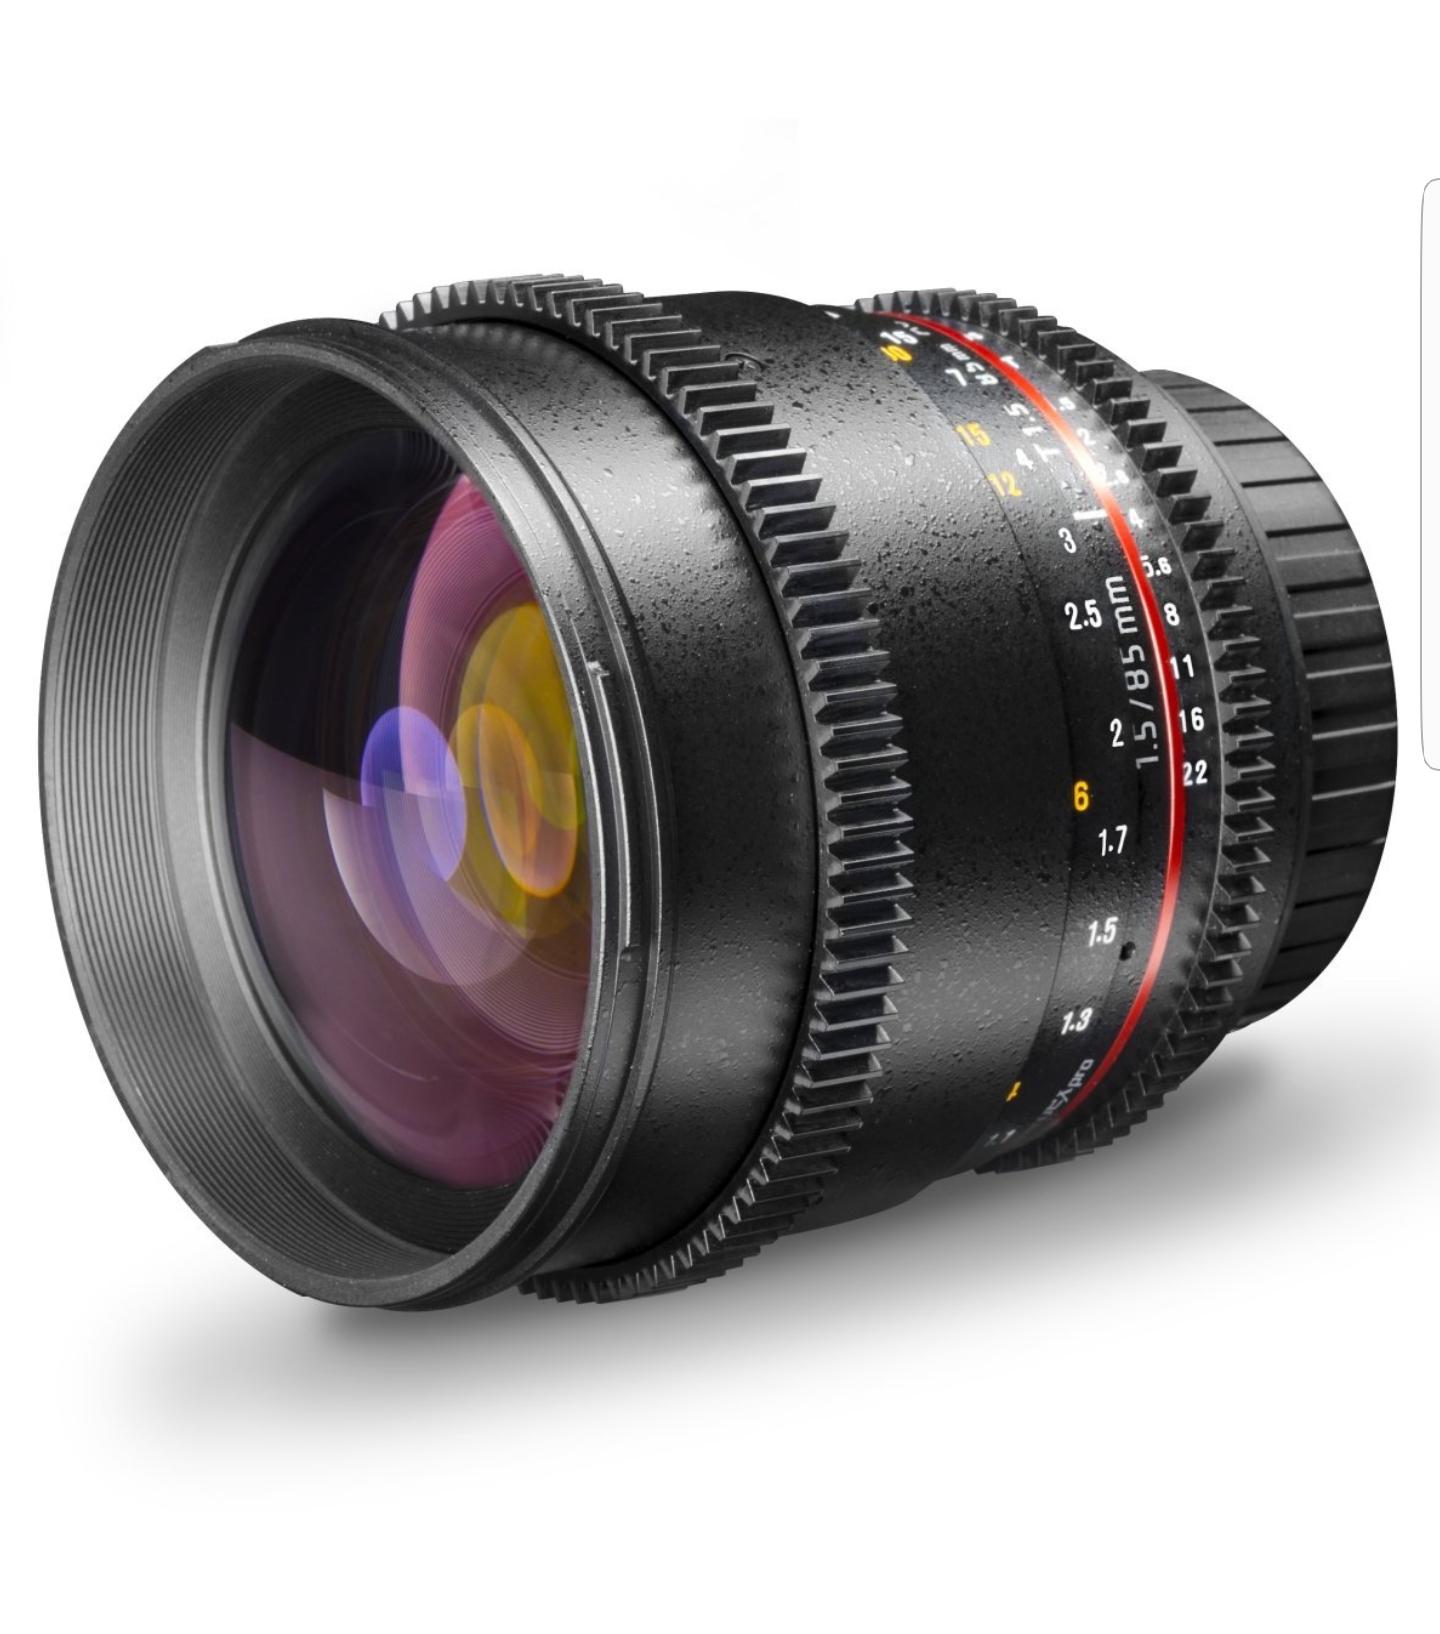 Walimex Pro 85mm 1:1,5 VDSLR Video- und Fotoobjektiv für Nikon F Objektivbajonett schwarzfür 200,68€ statt 335€